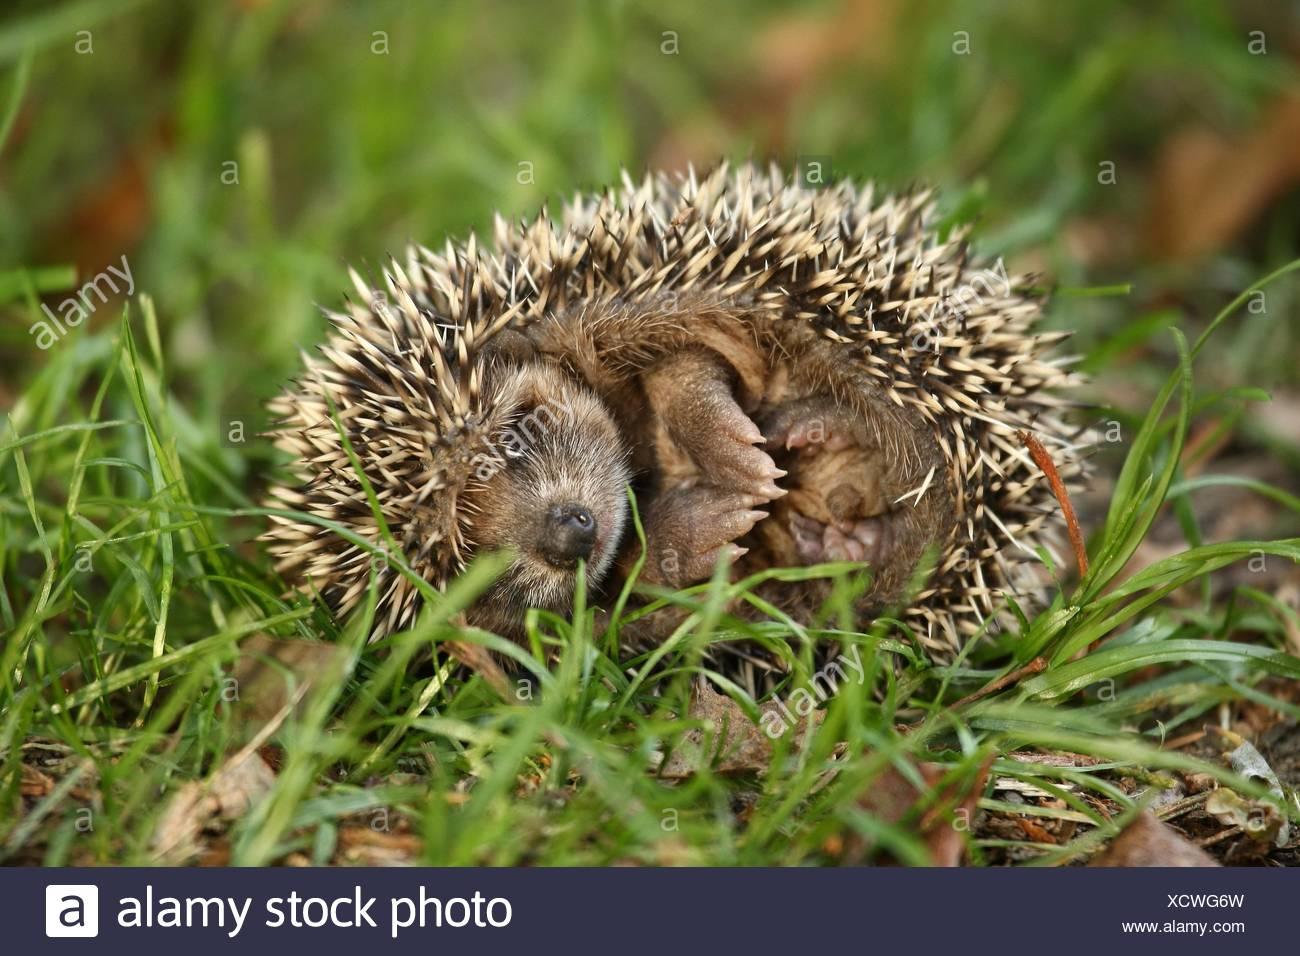 young hedgehog - Stock Image